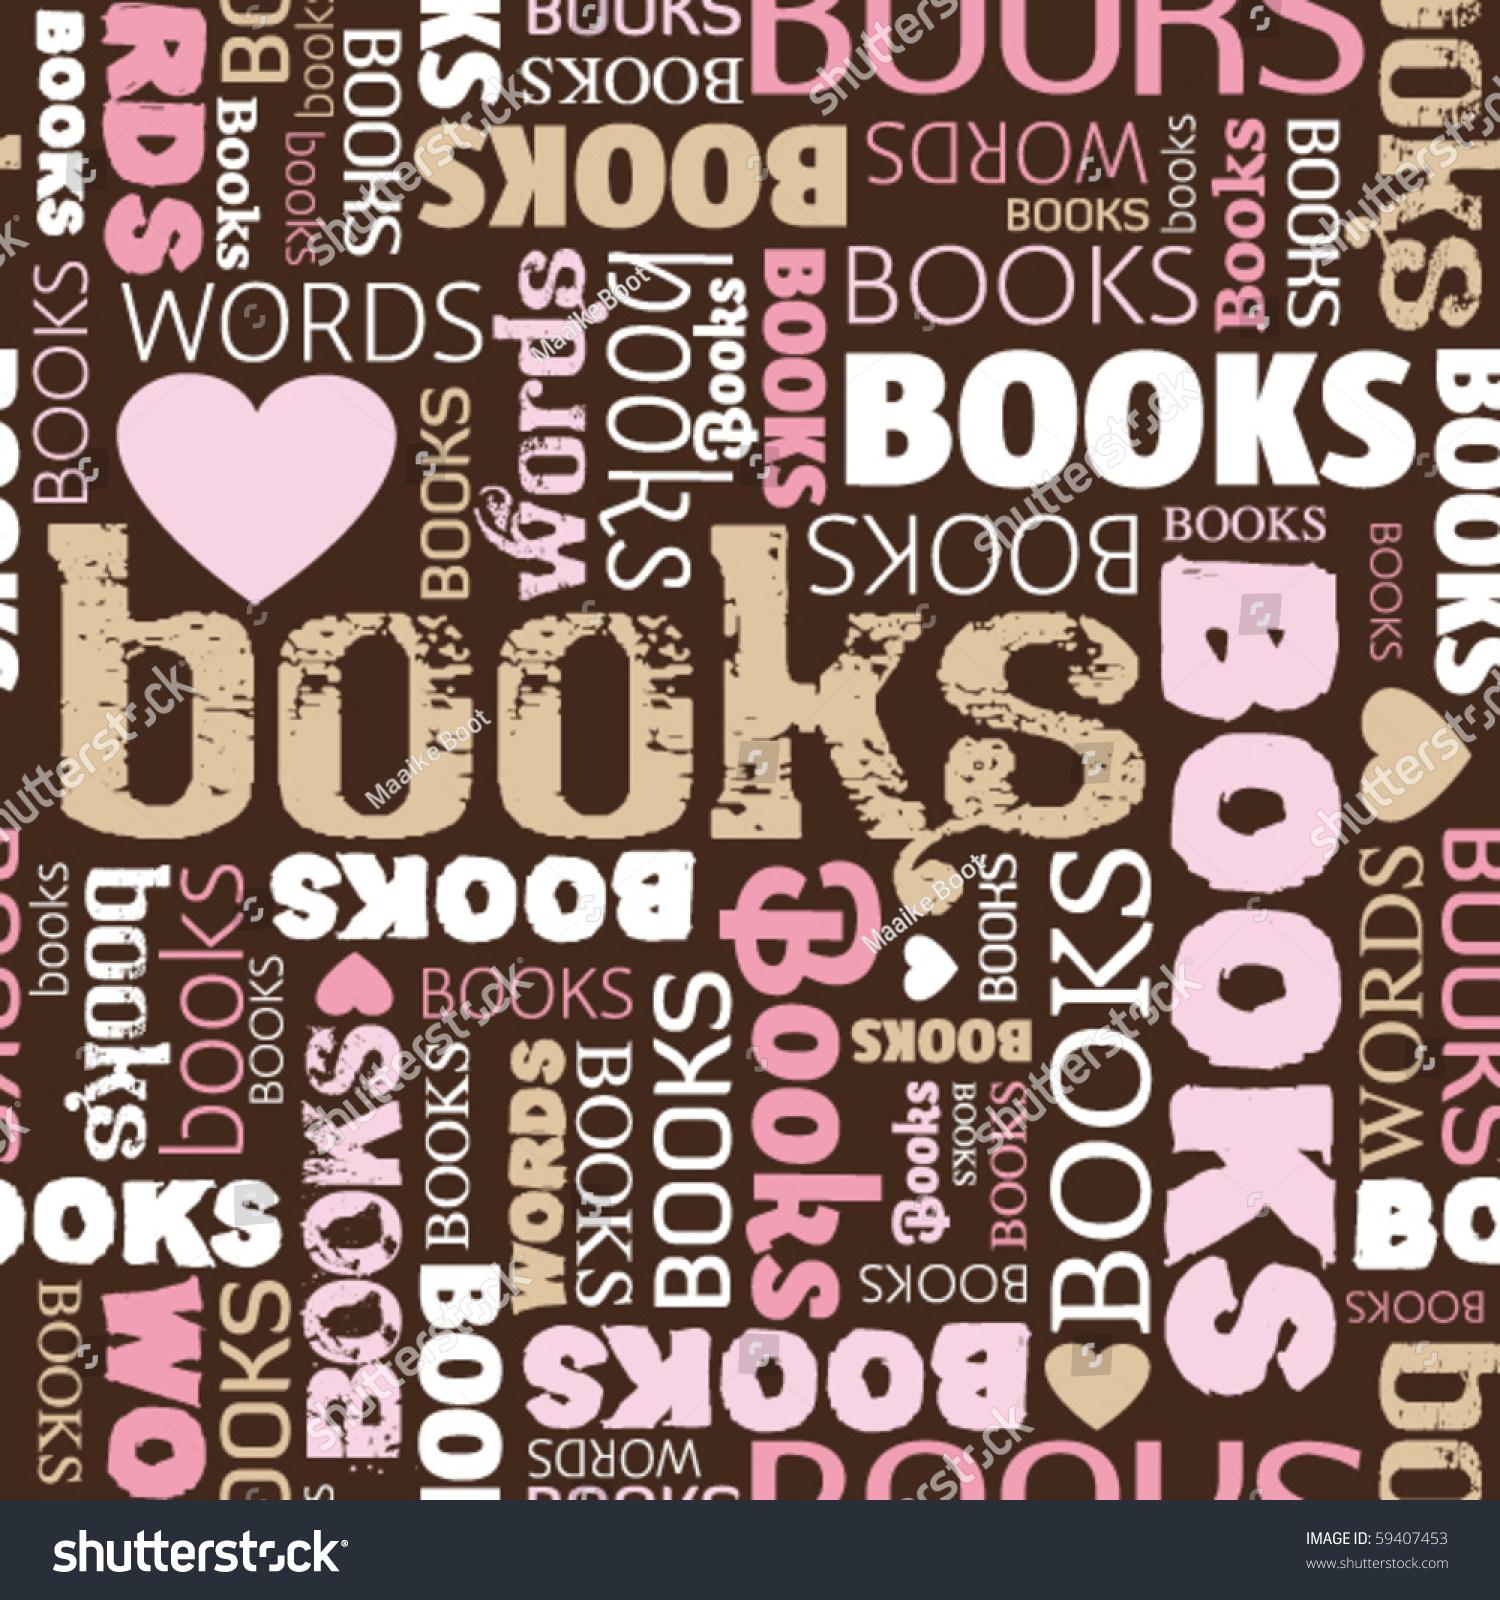 I Love Books Seamless Pattern Background In Vector - 59407453 : Shutterstock